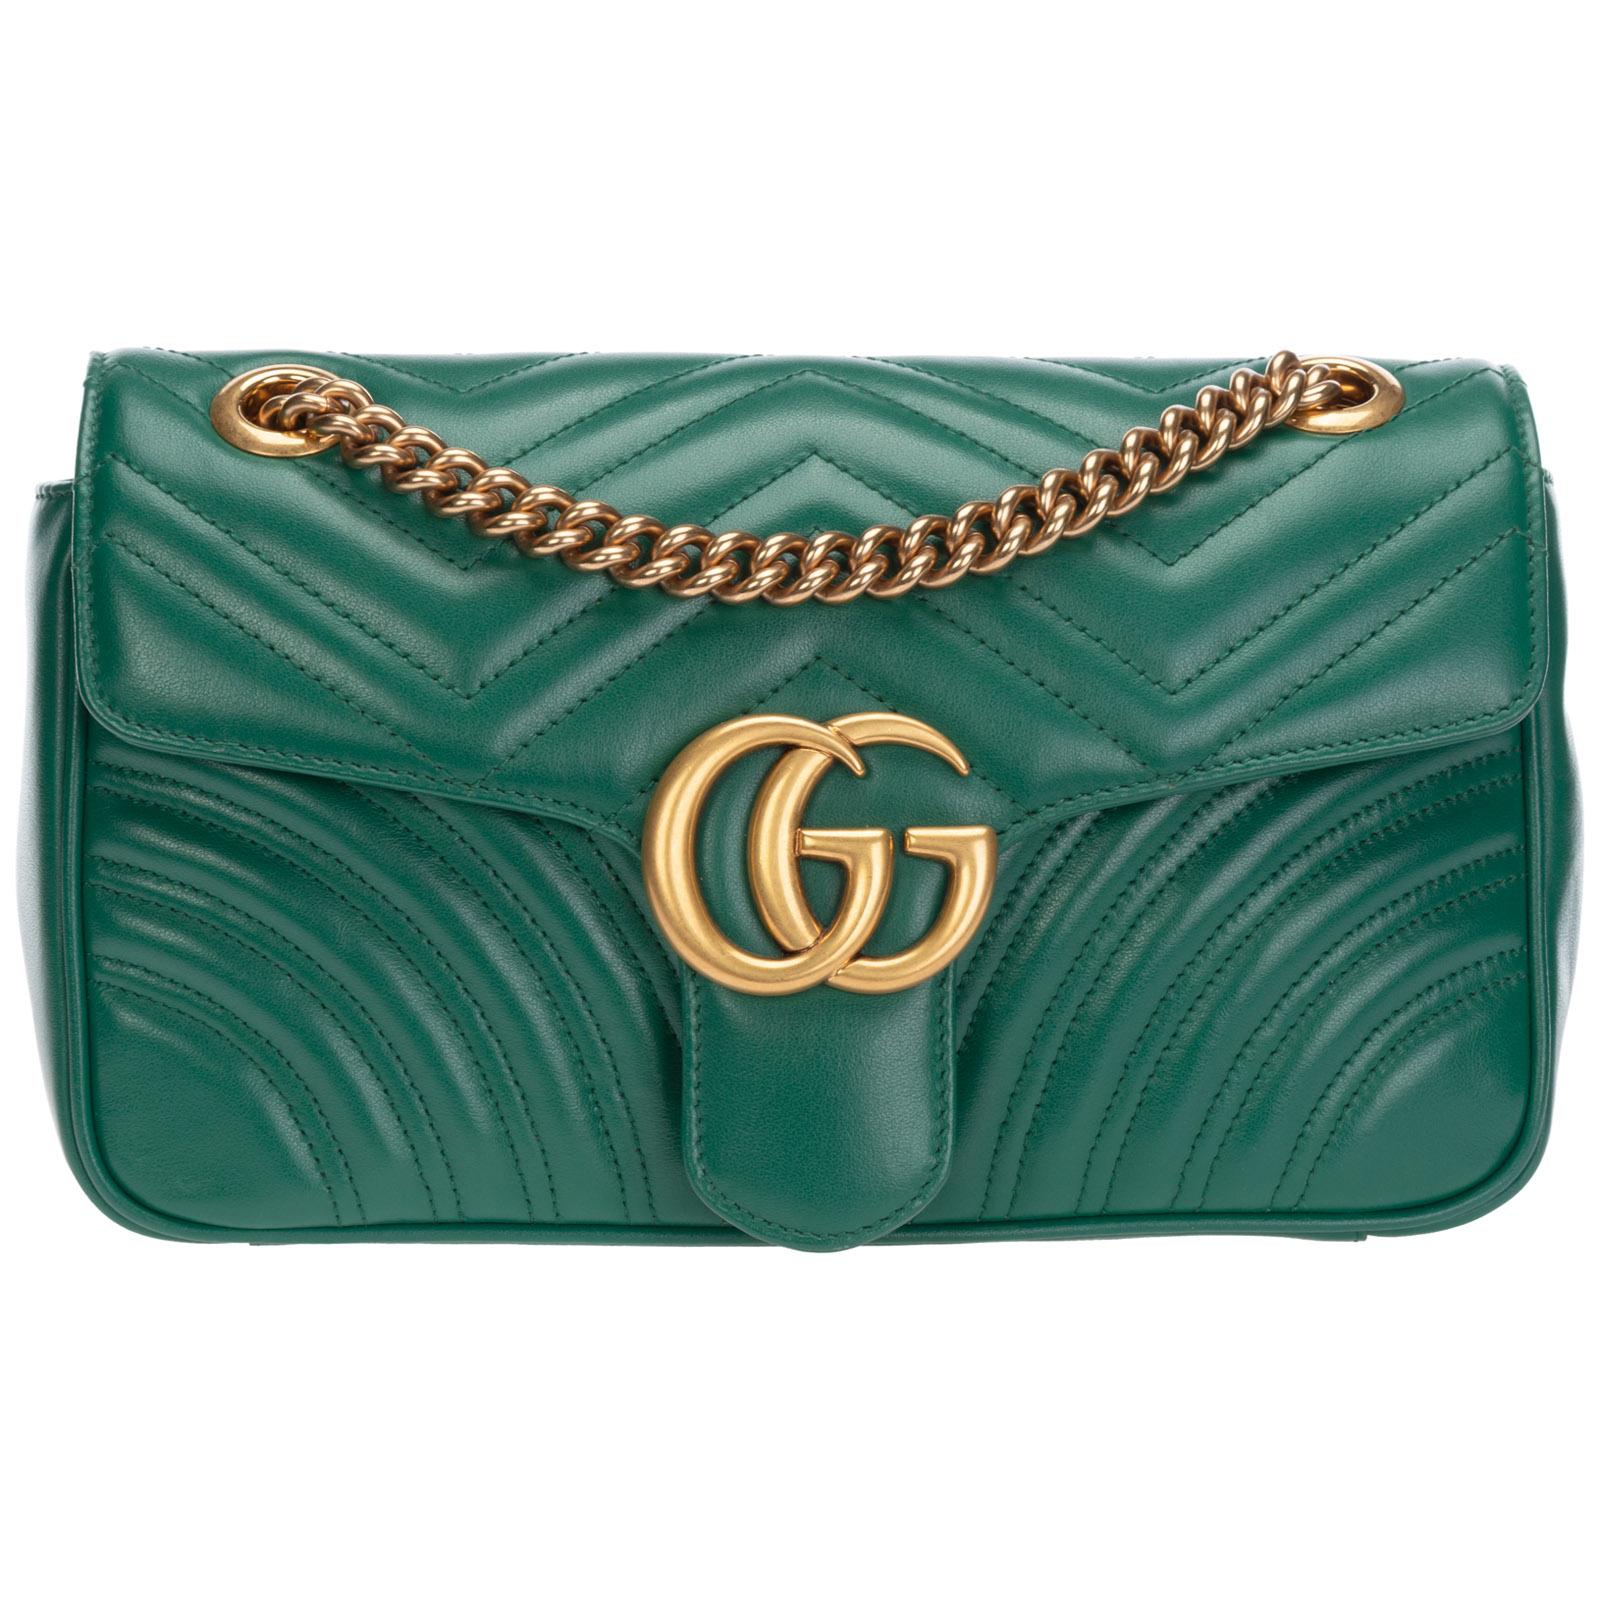 Gucci Shoulder bags WOMEN'S LEATHER SHOULDER BAG GG MARMONT